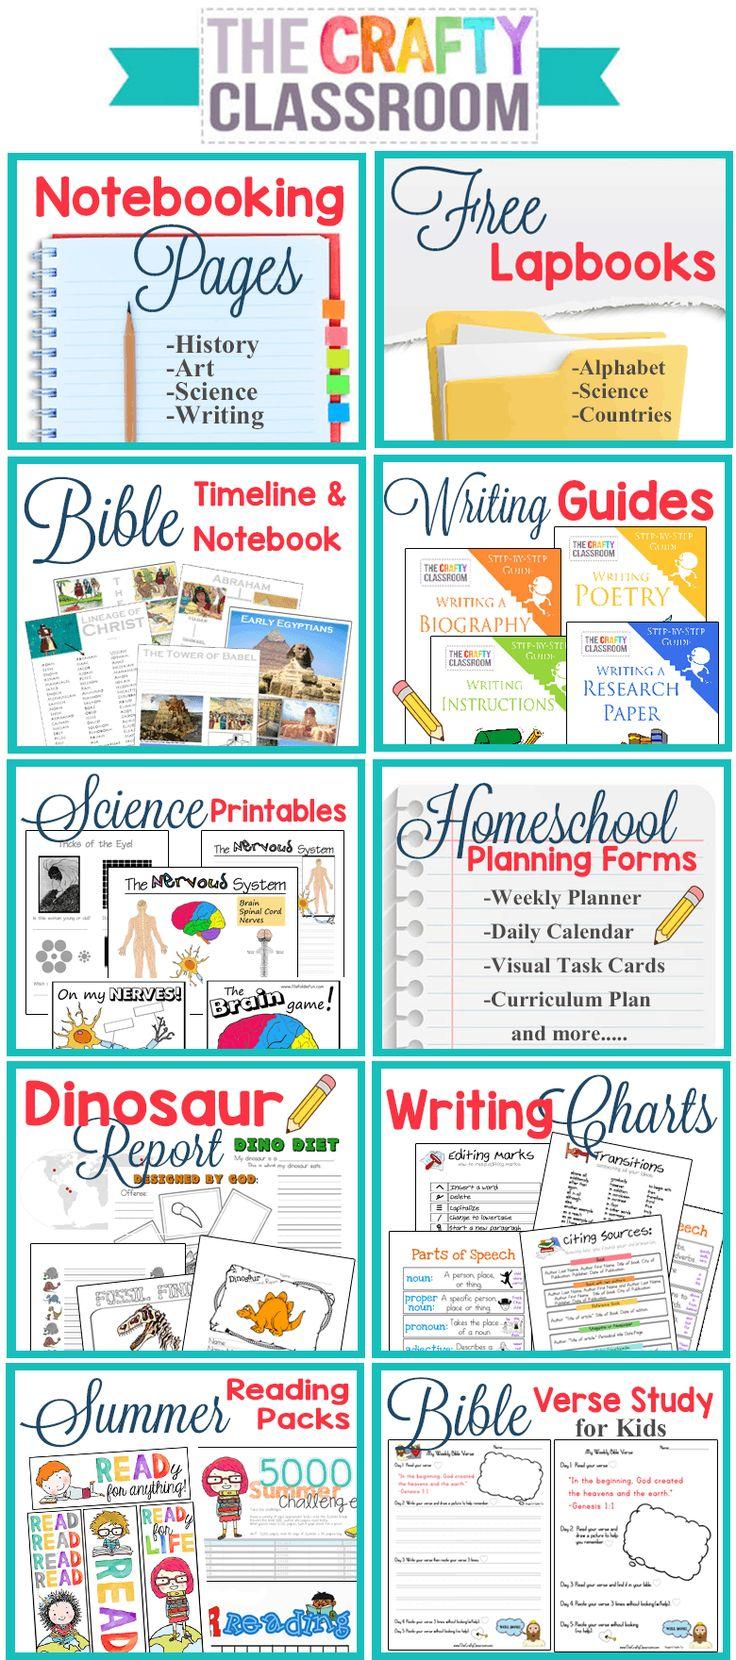 Homeschool Printables on Homeschool, Home schooling